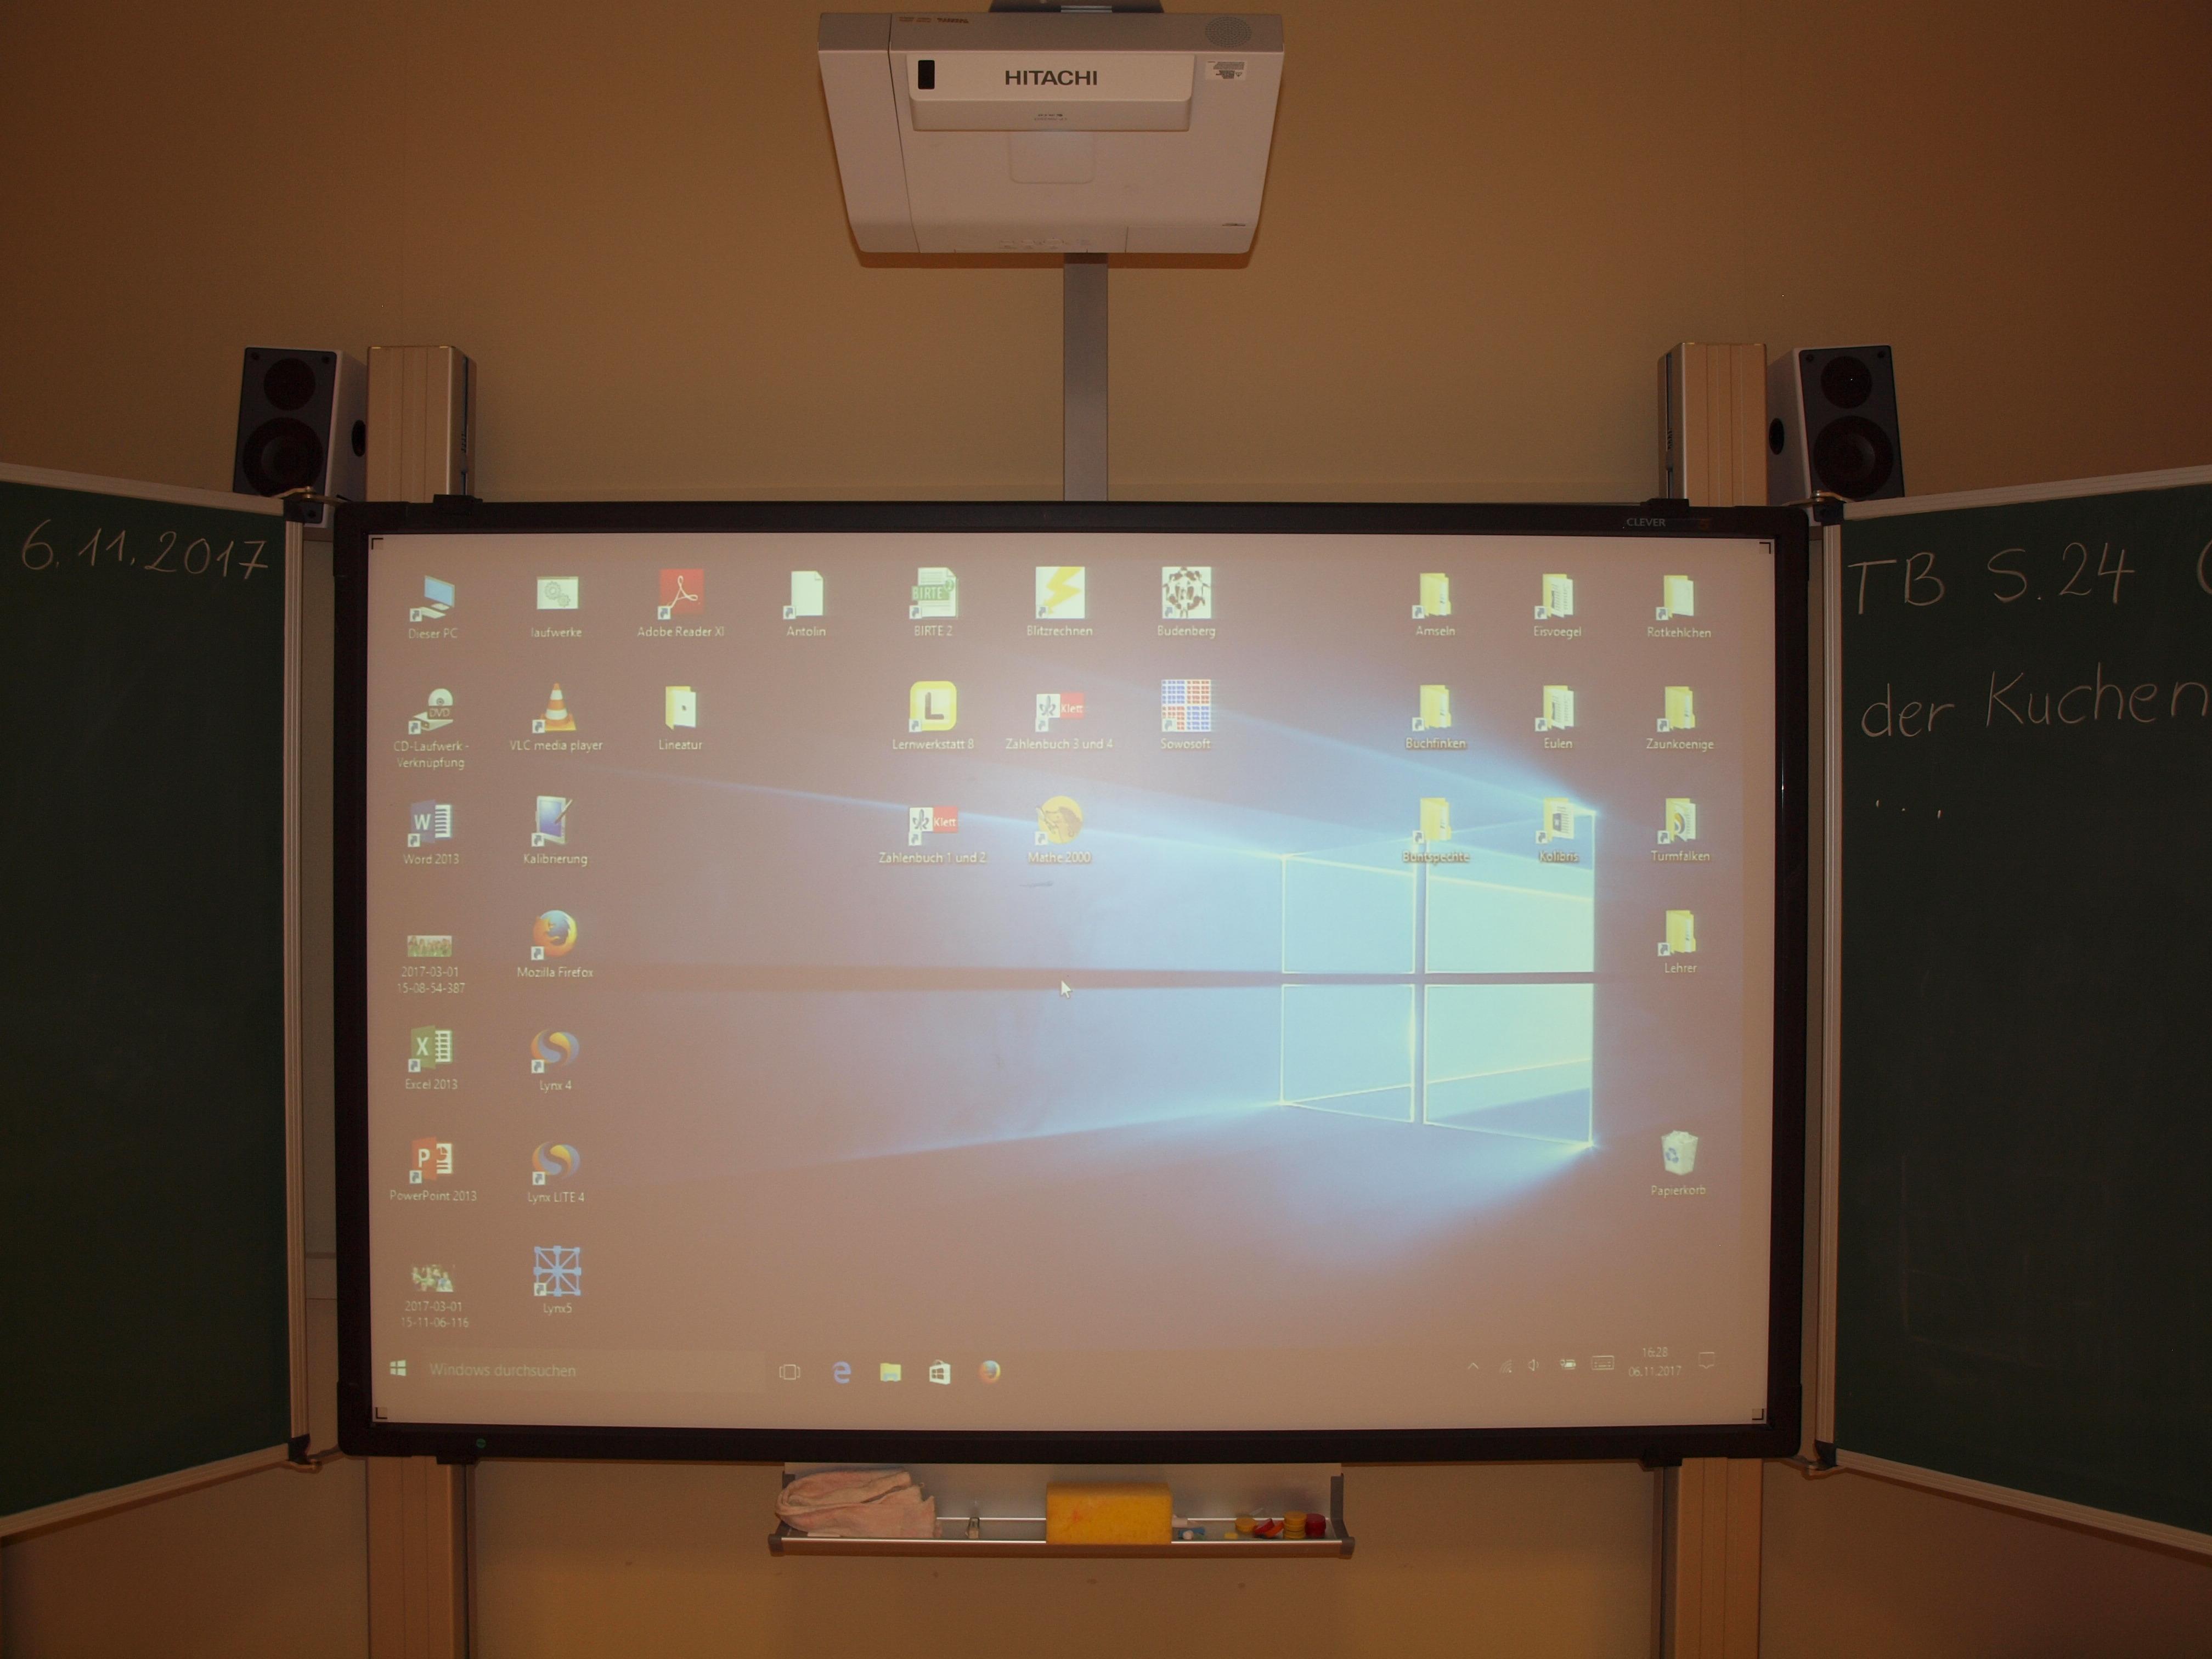 Digitale Tafelfelder in den Klassenräumen